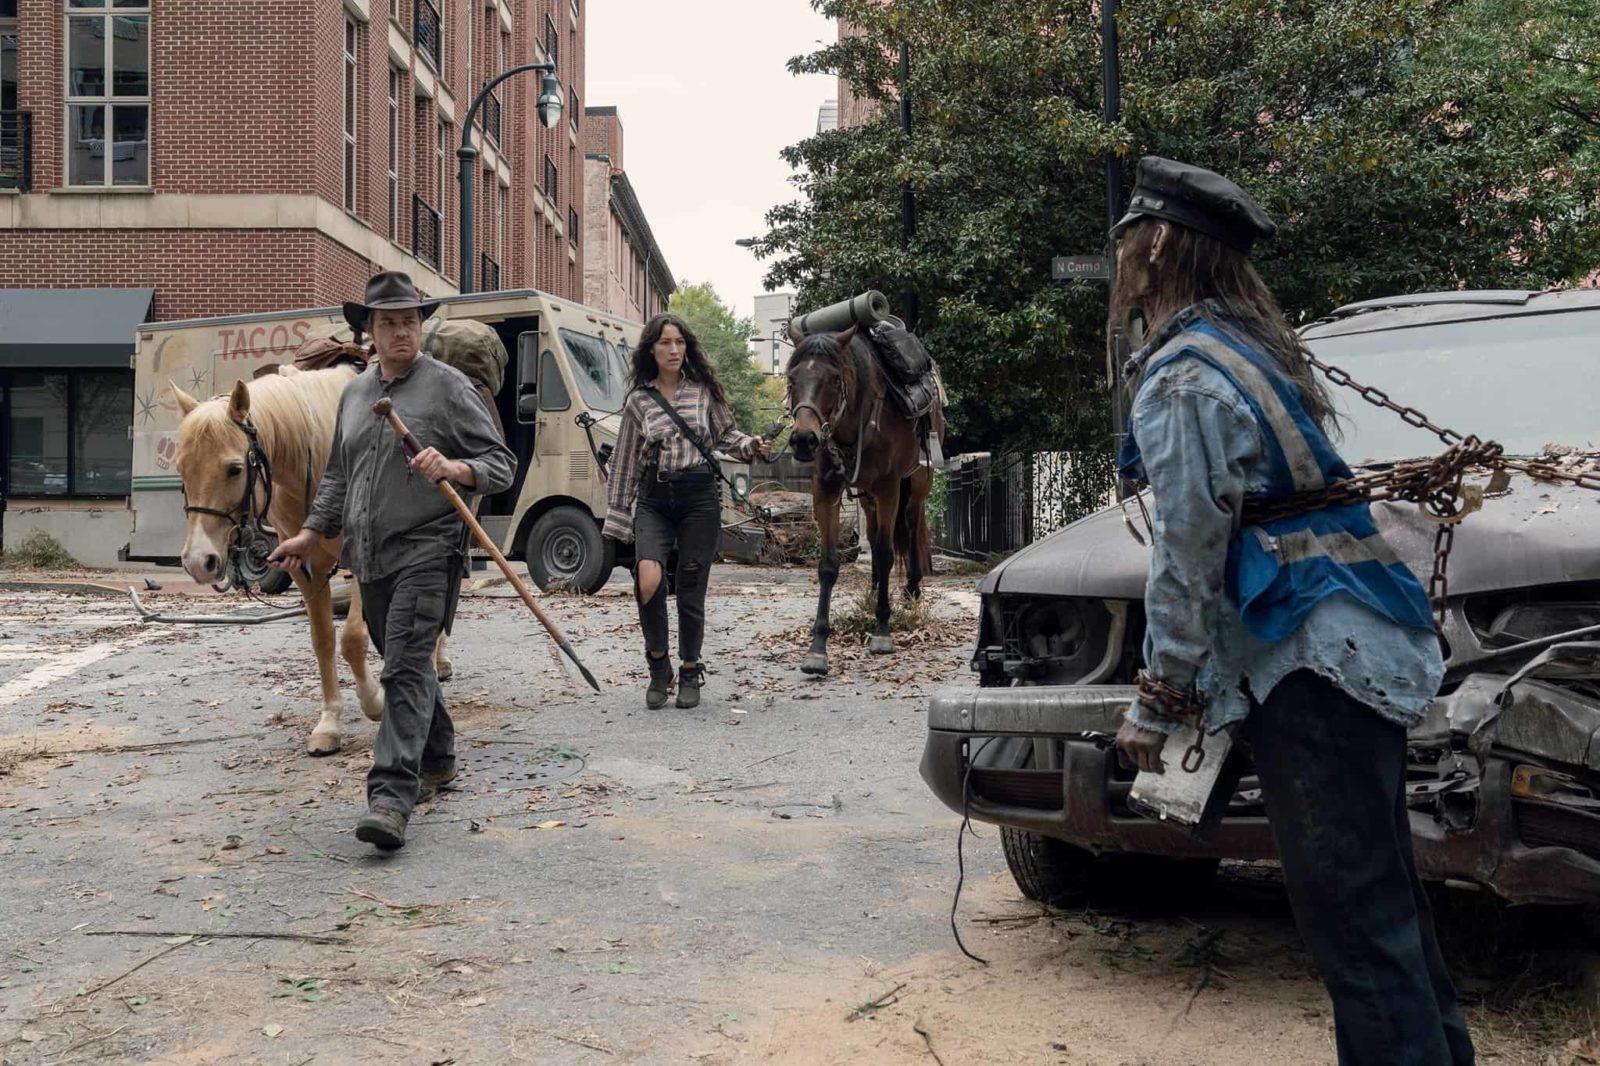 Eugene, Yumiko y Ezekiel, en el episodio 10x14 de The Walking Dead